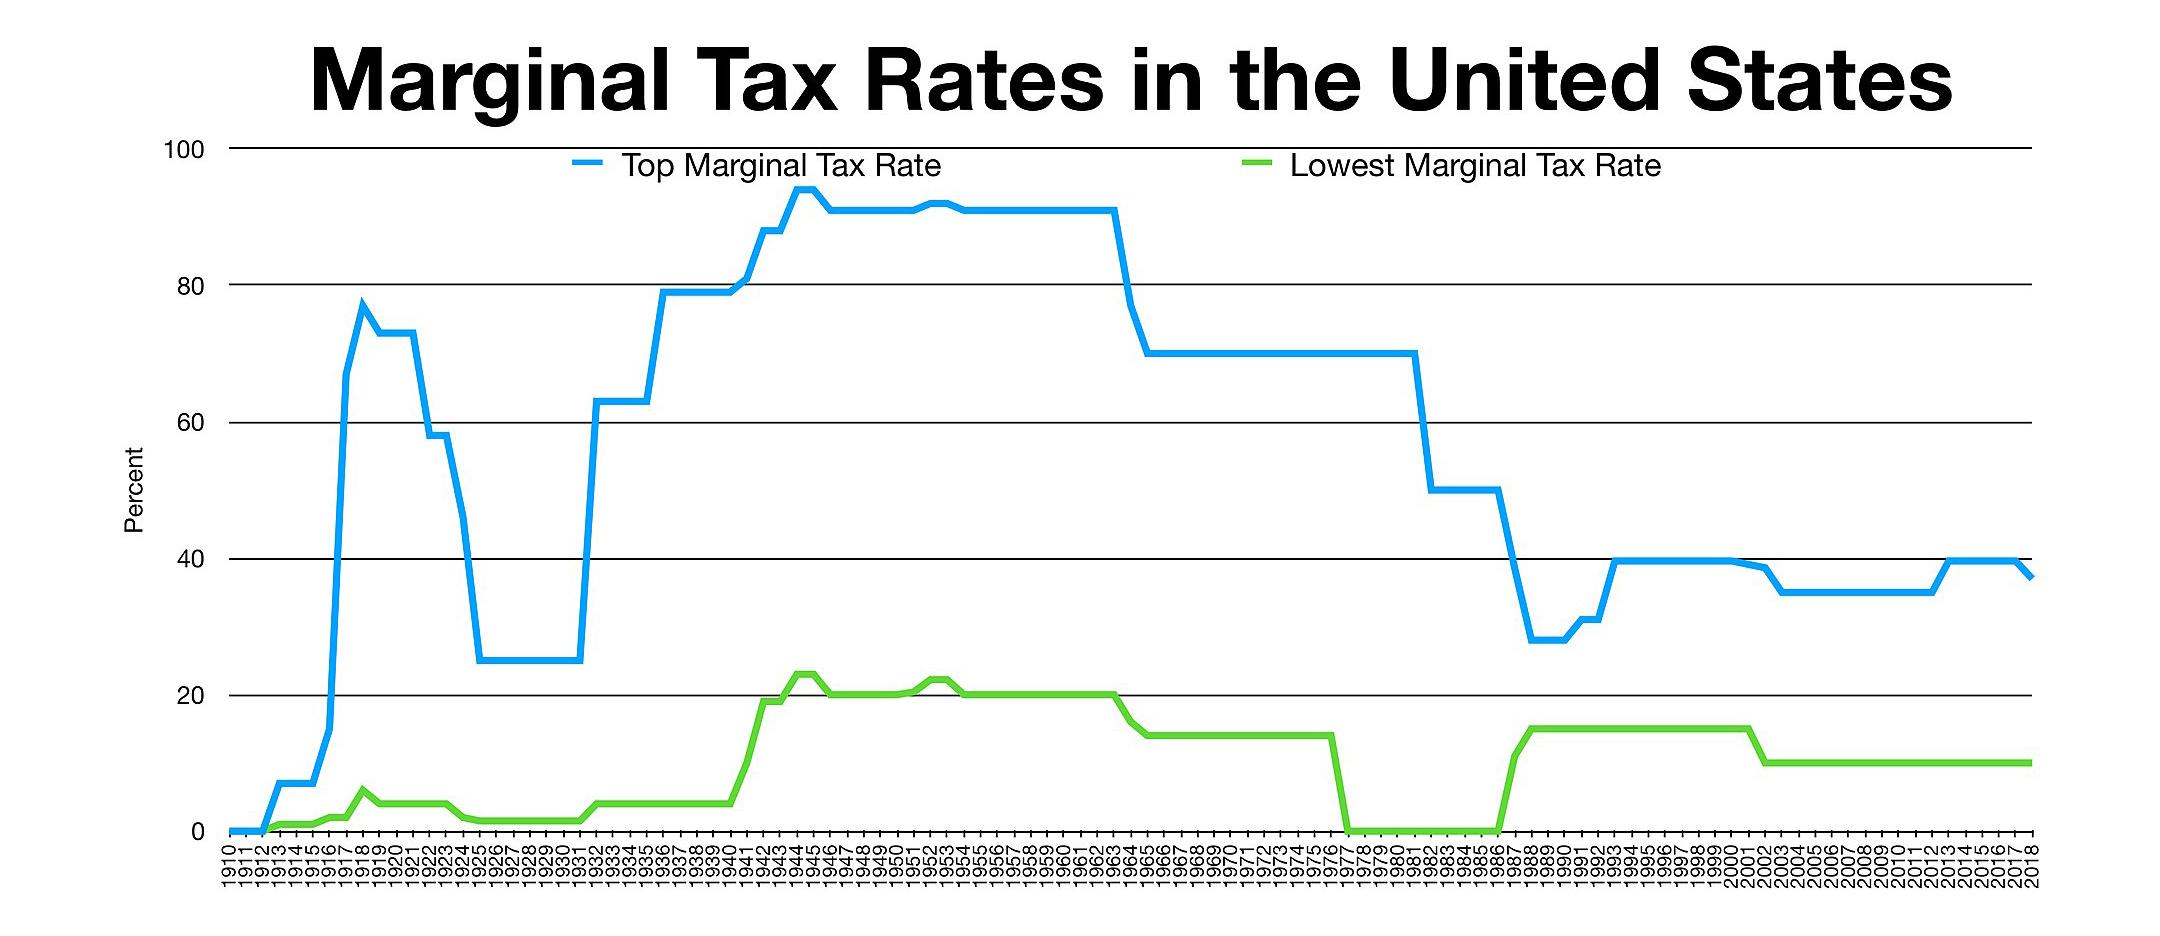 What is a fair tax system?